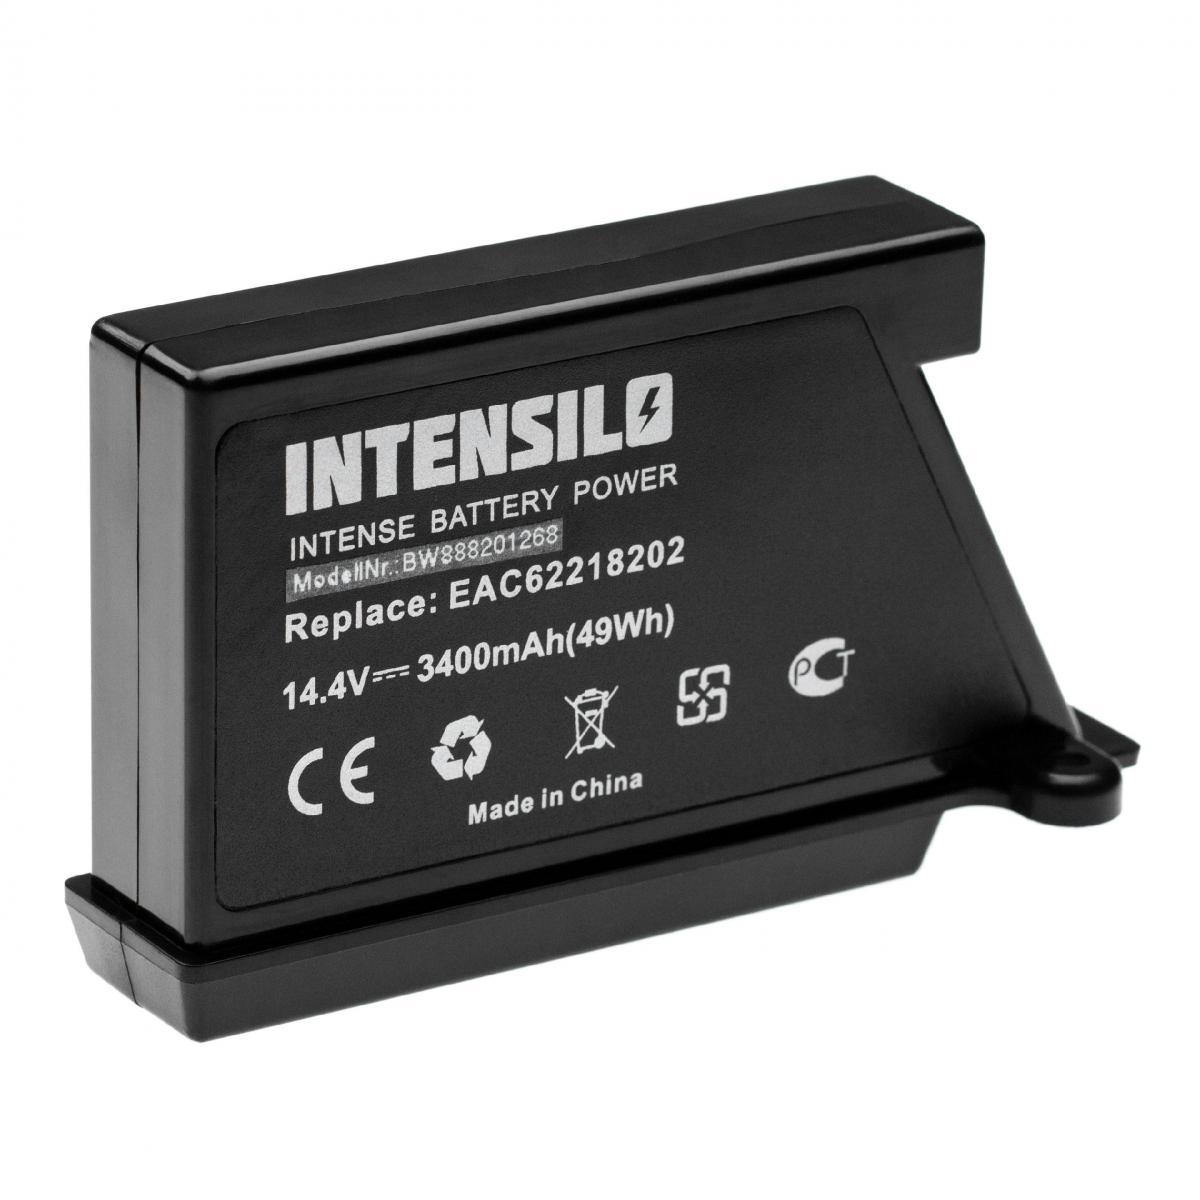 Vhbw INTENSILO Batterie compatible avec LG HOM-BOT VR6270LV, VR6270LVB, VR6270LVM robot électroménager (3400mAh, 14,4V, Li-io